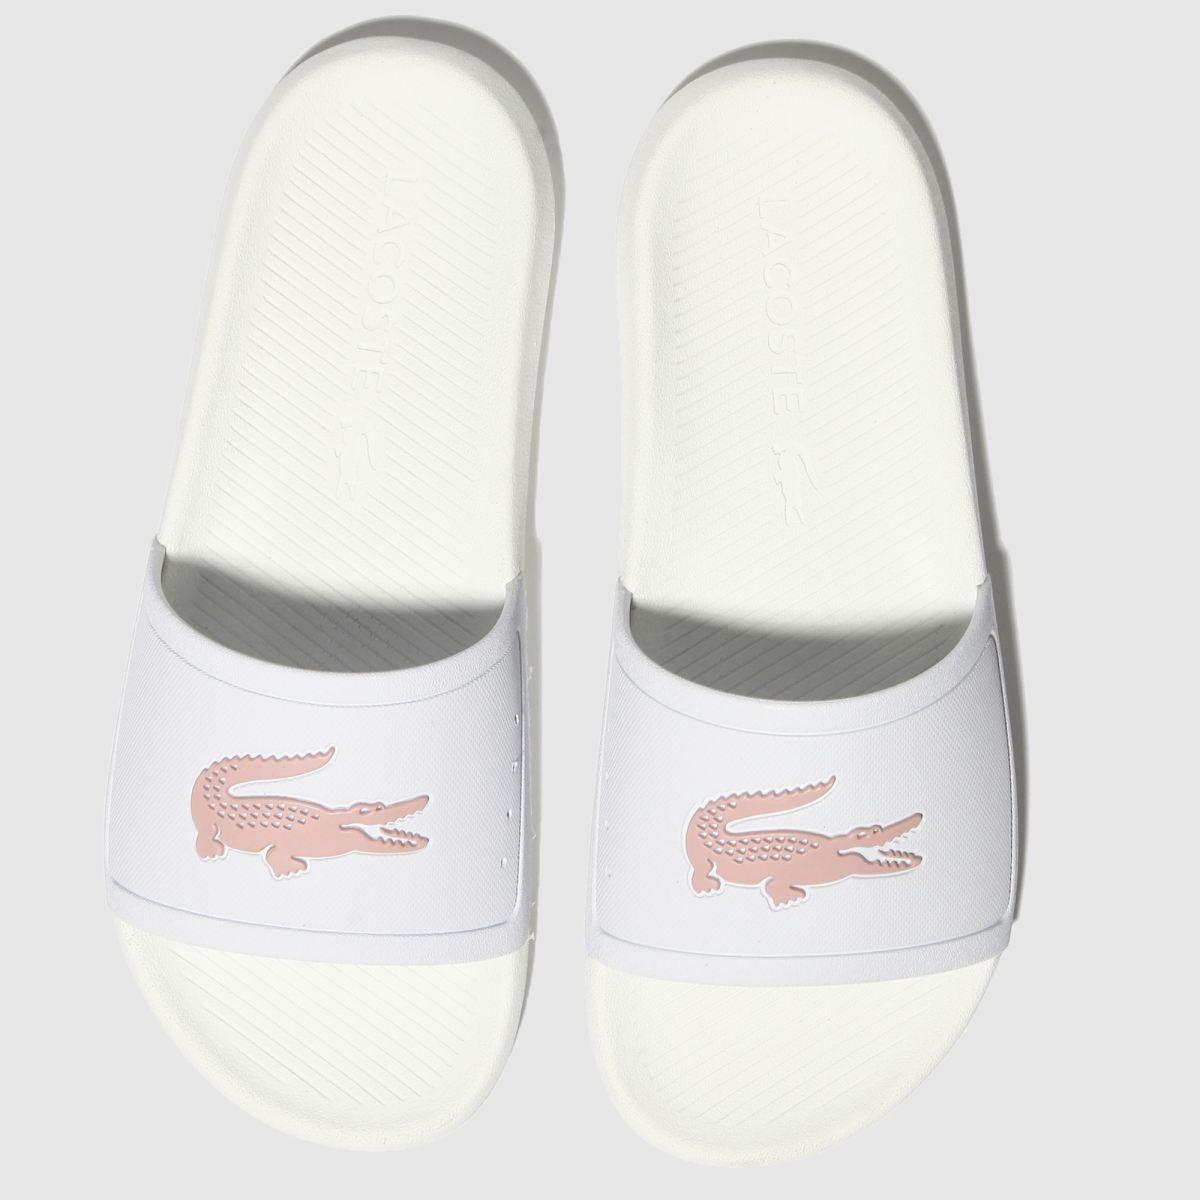 c2cb4f9b3 Lacoste White   Pink Croco Slide 119 3 Sandals